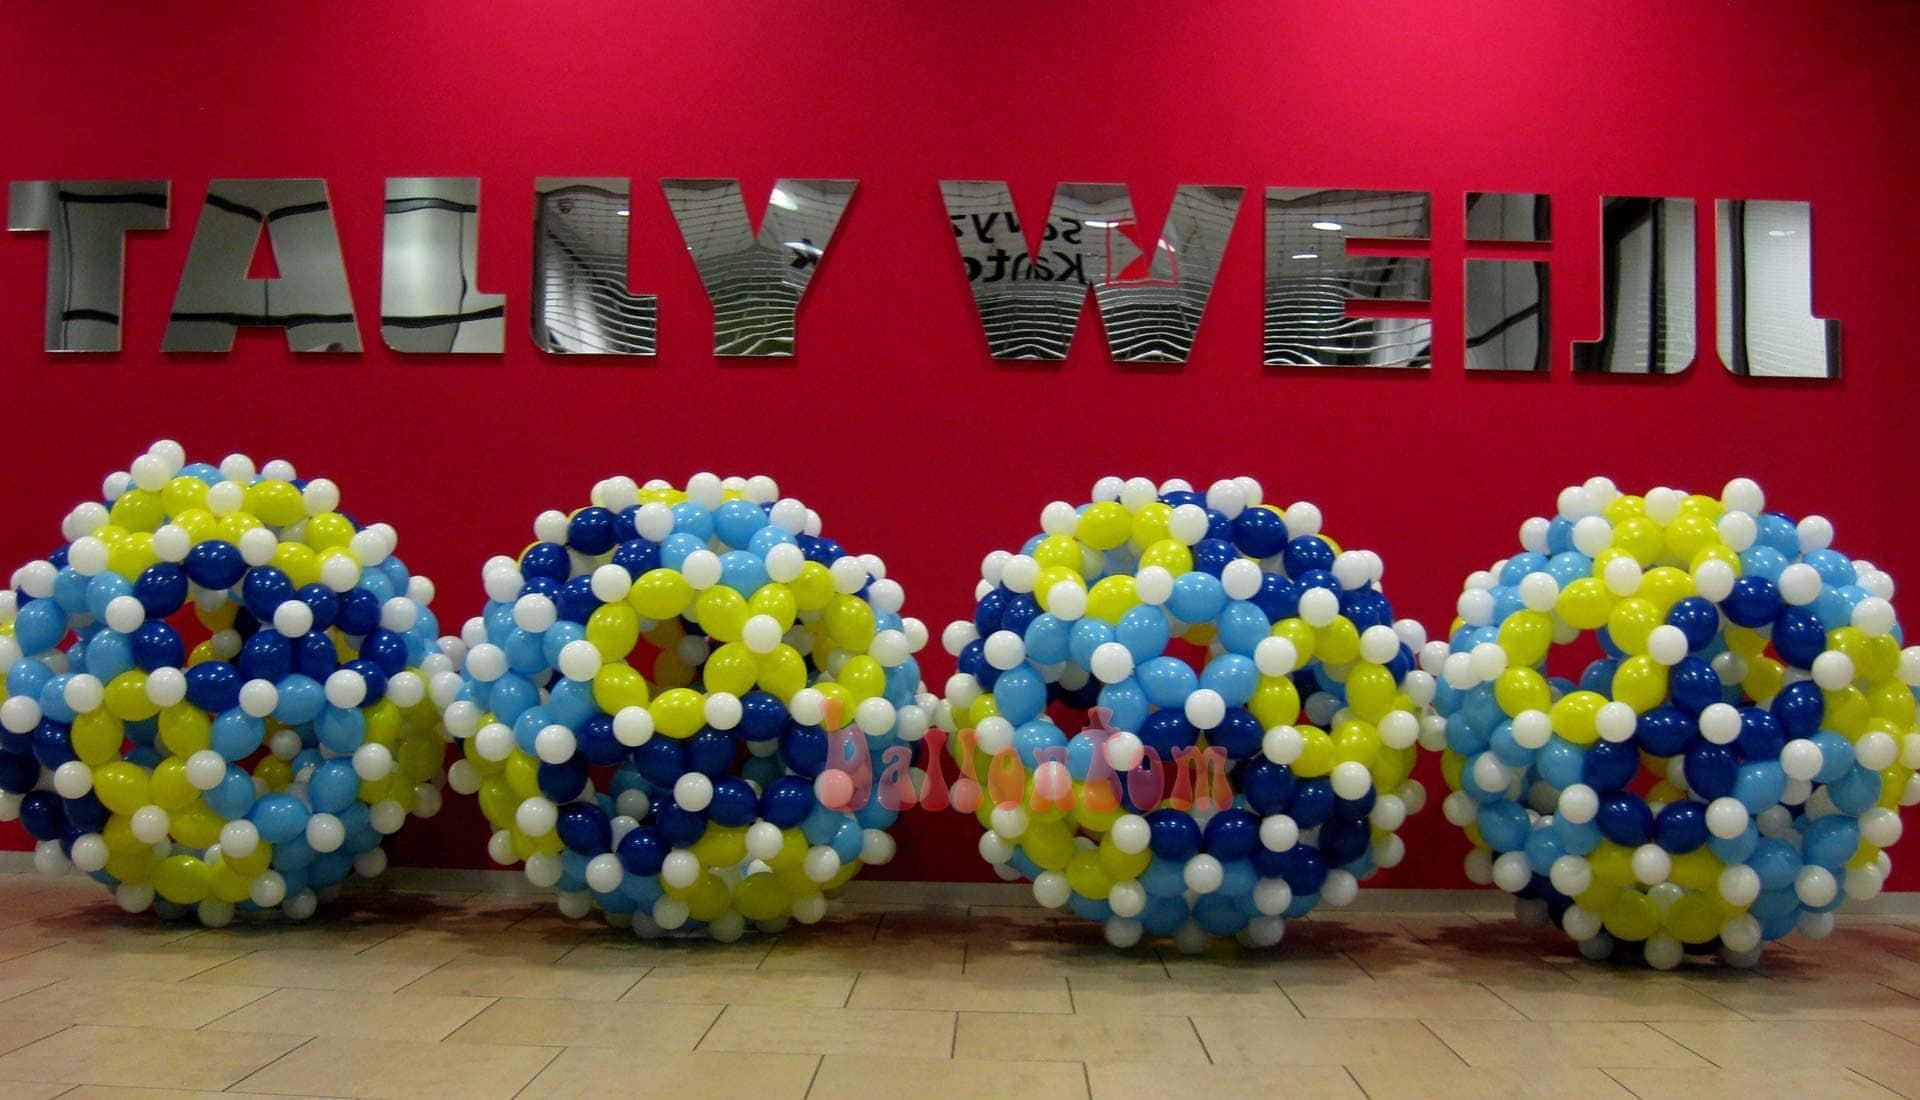 Ballonbälle von ballontom zum Jubiläum Seedam Center - Projekt: Ballonbox - Foto: Walter Businger